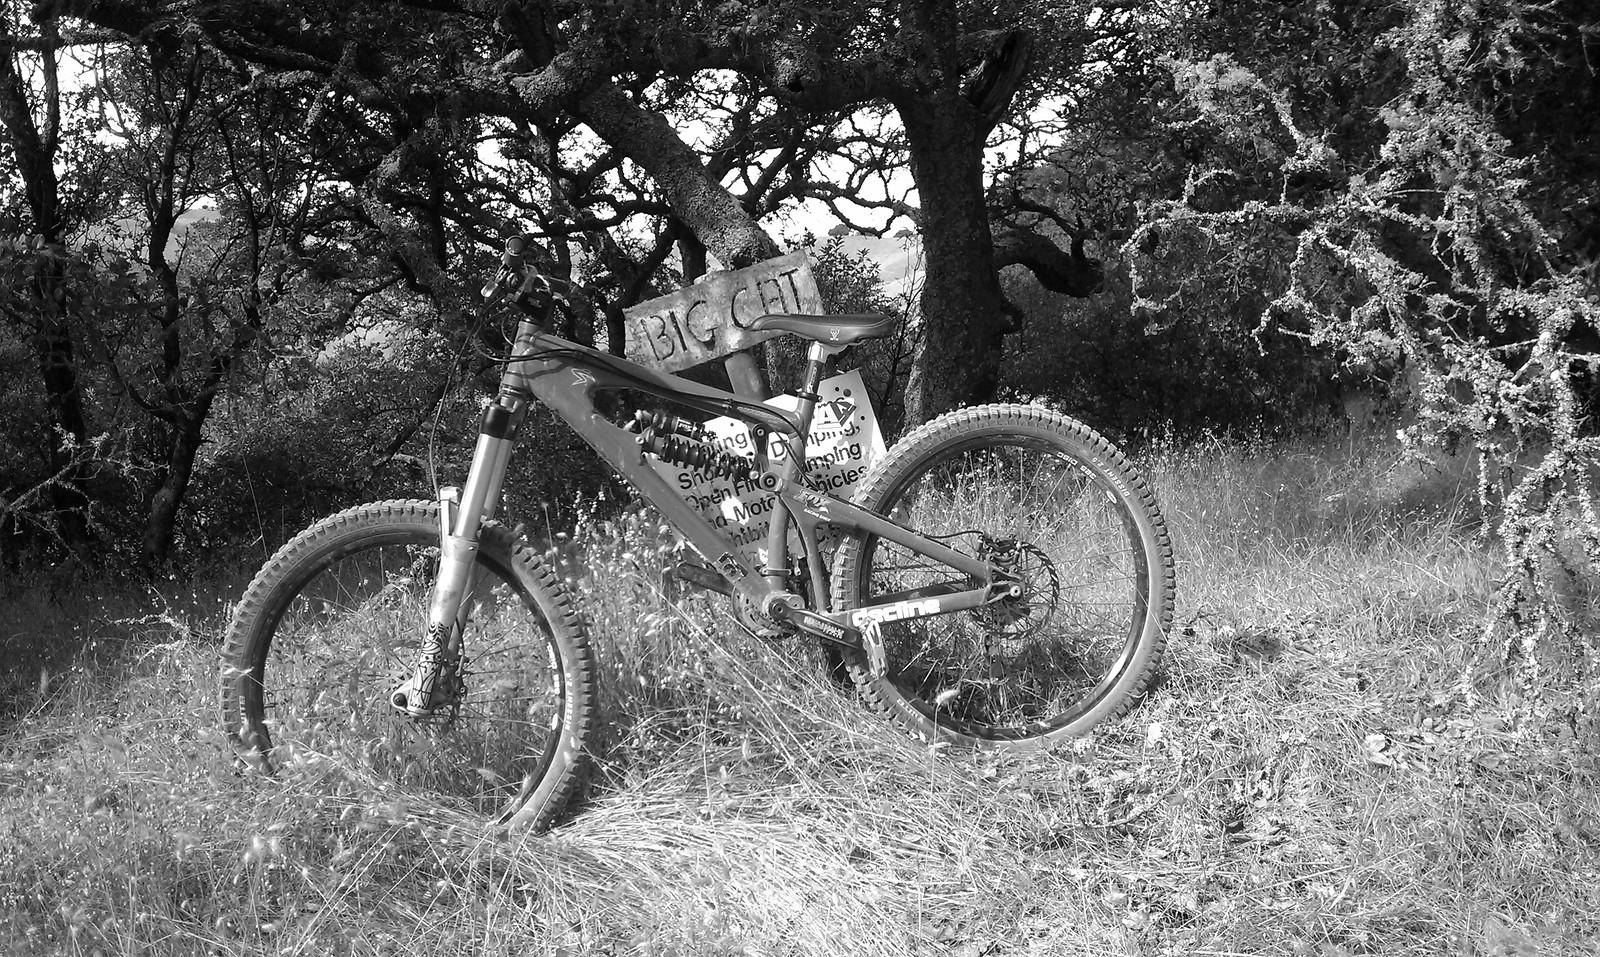 038 - supermachete - Mountain Biking Pictures - Vital MTB